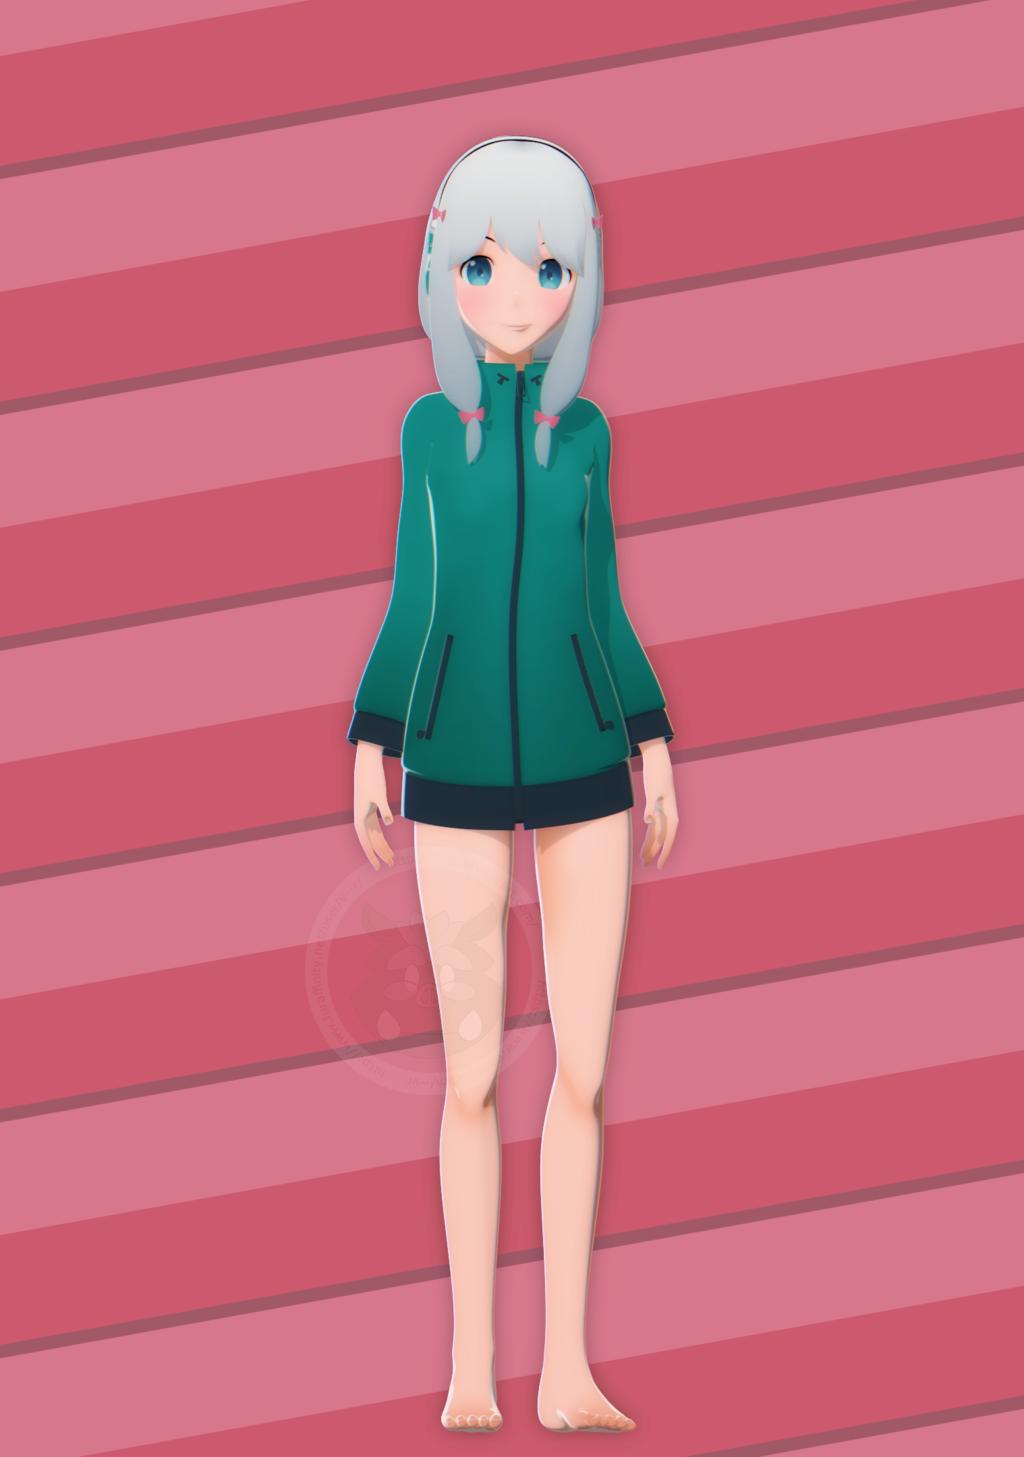 Eromanga Sensei - Sagiri Izumi